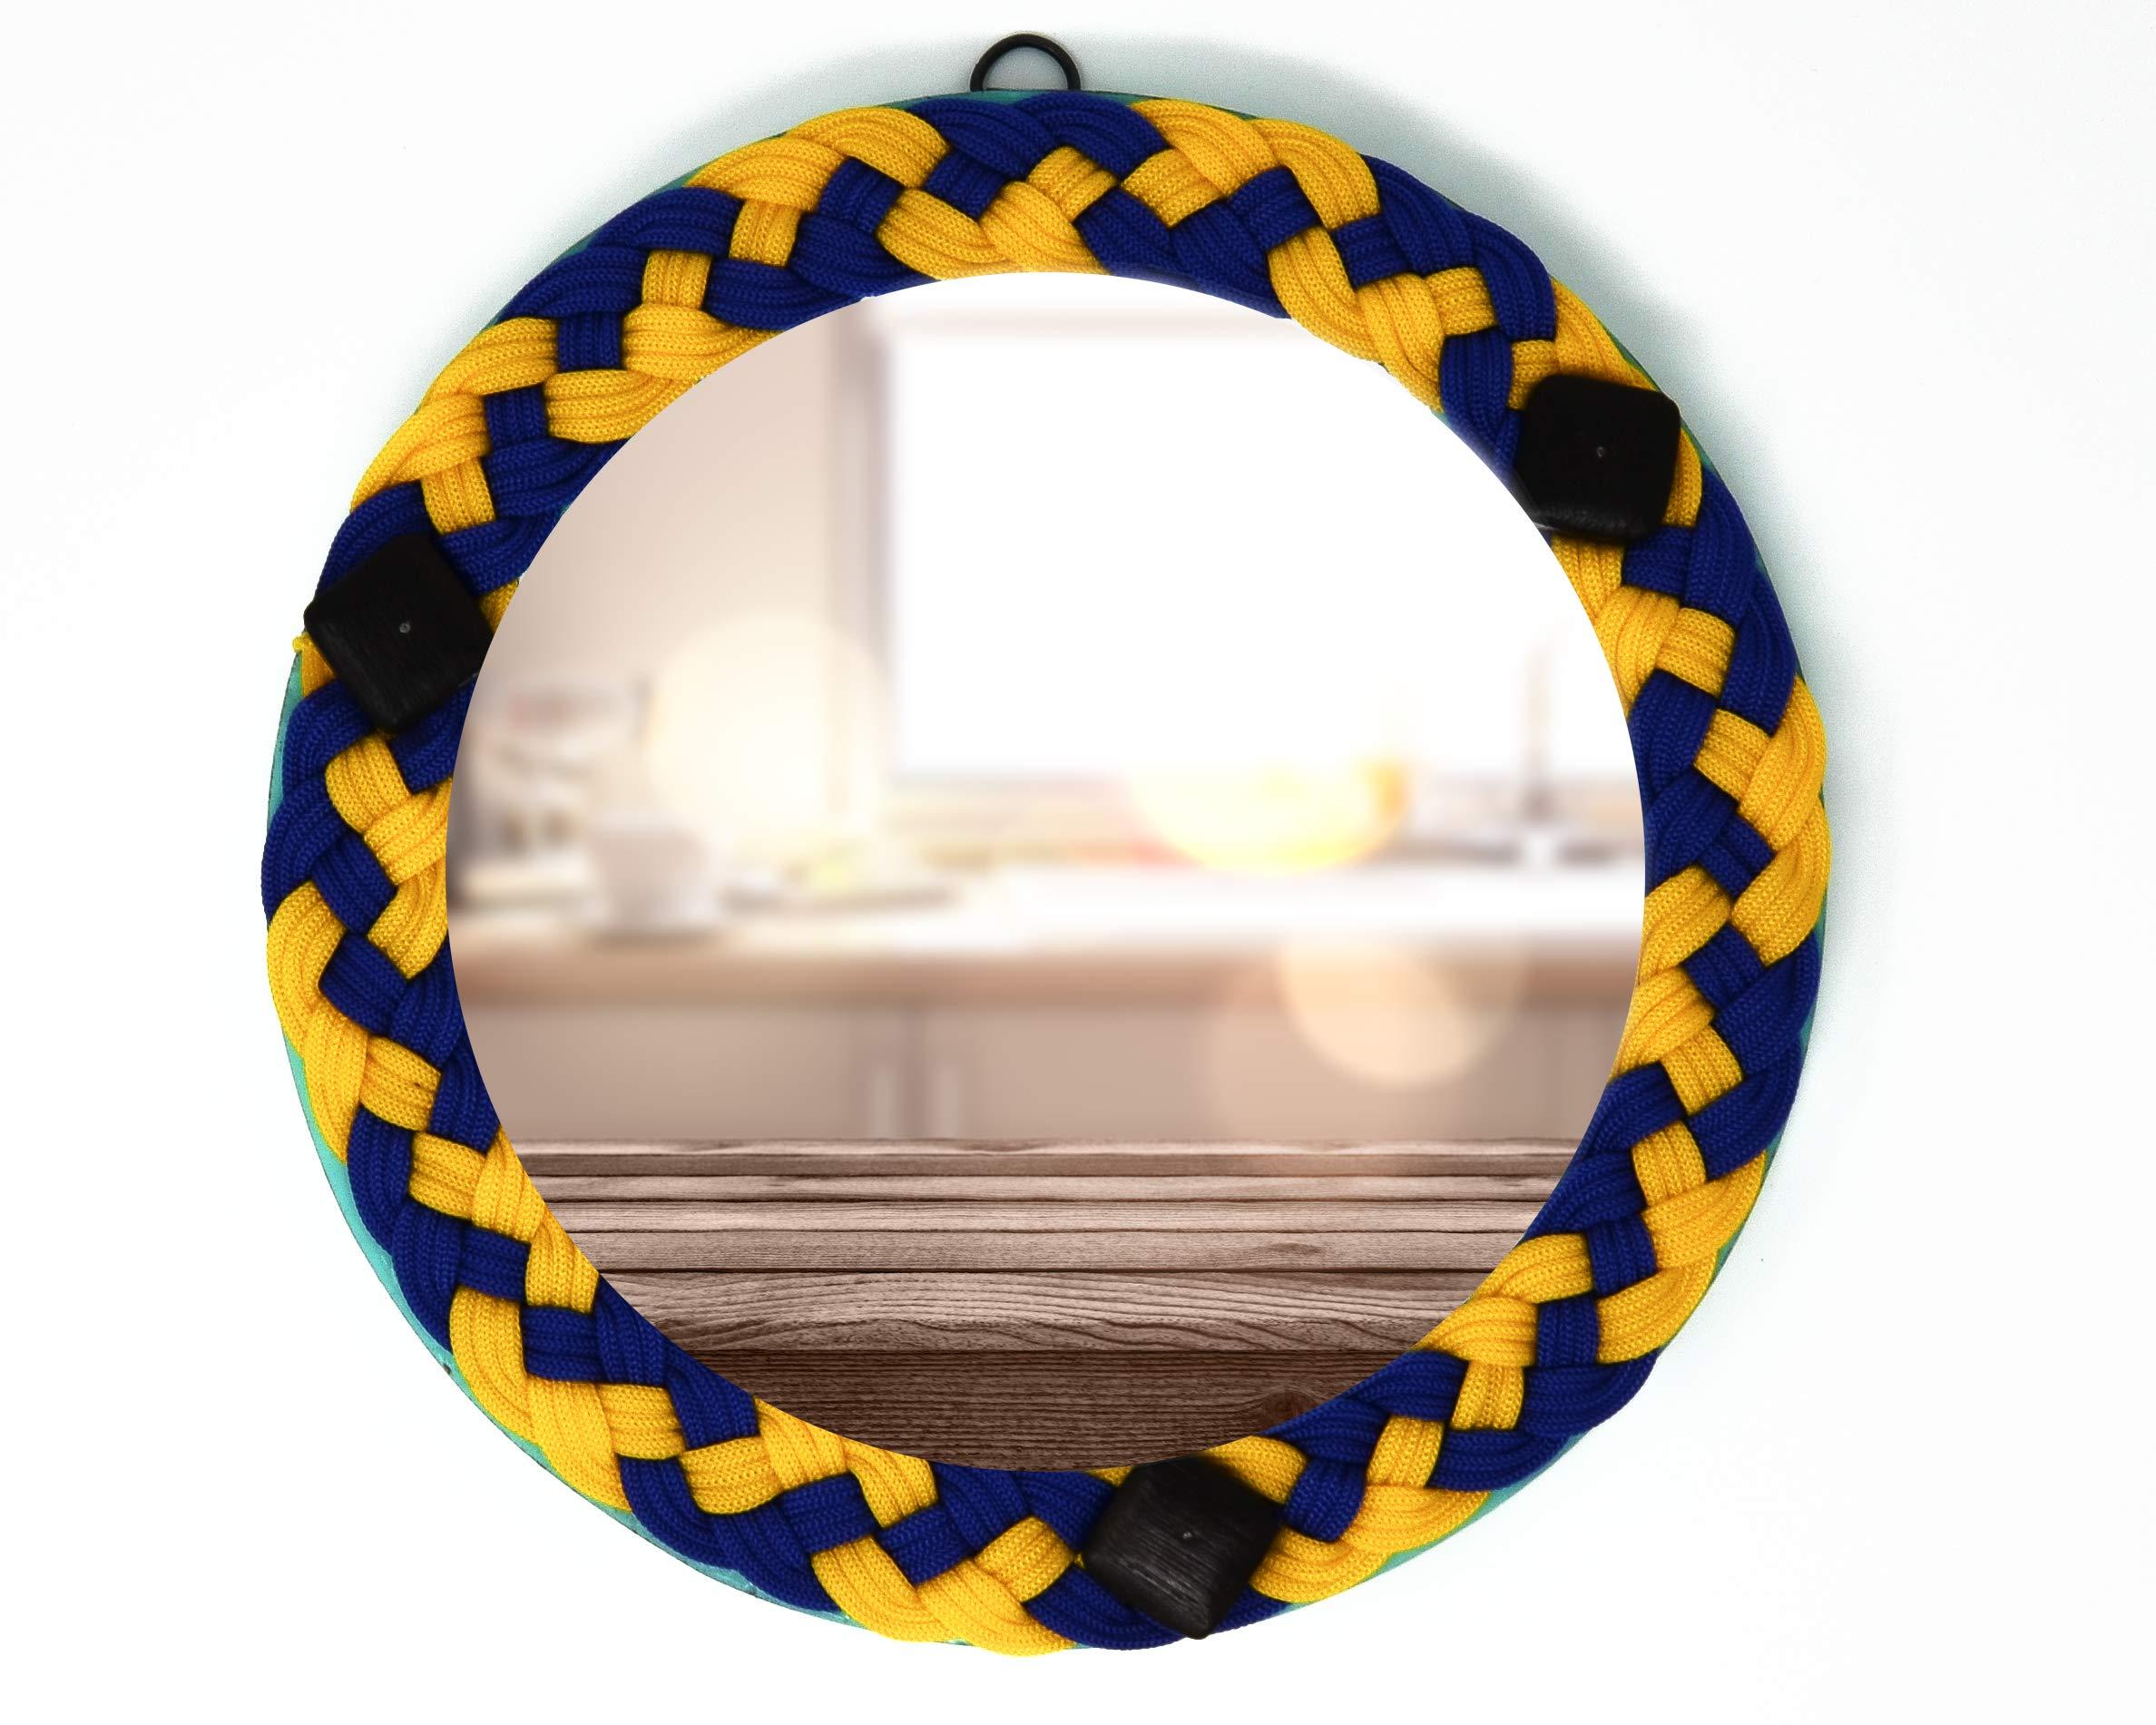 ARTISANS CRAFT - Beautifully Handmade & Handcrafted Premium Wall Mounted Mirror Weaving Silk Thread Work on Border, Home Decor, Home Improvement (9 X 9)